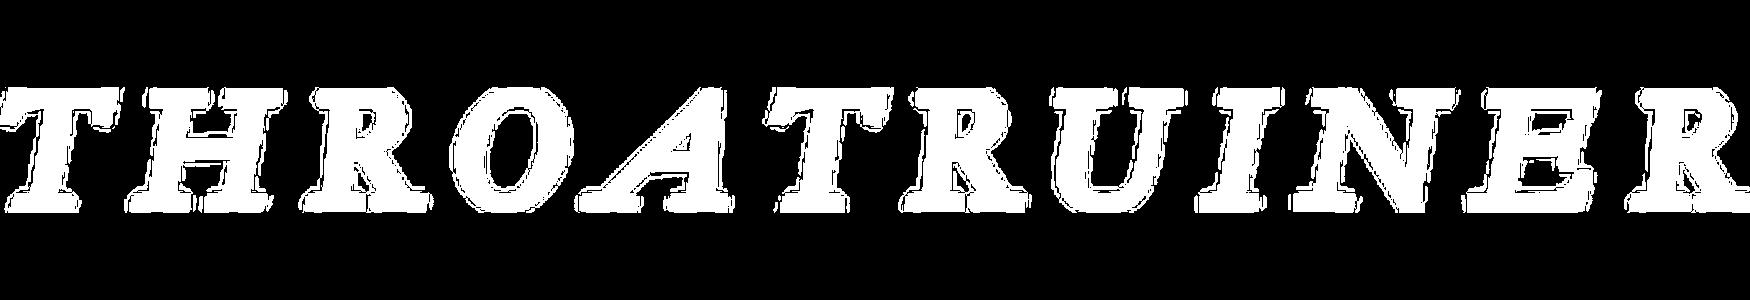 European Store Logo